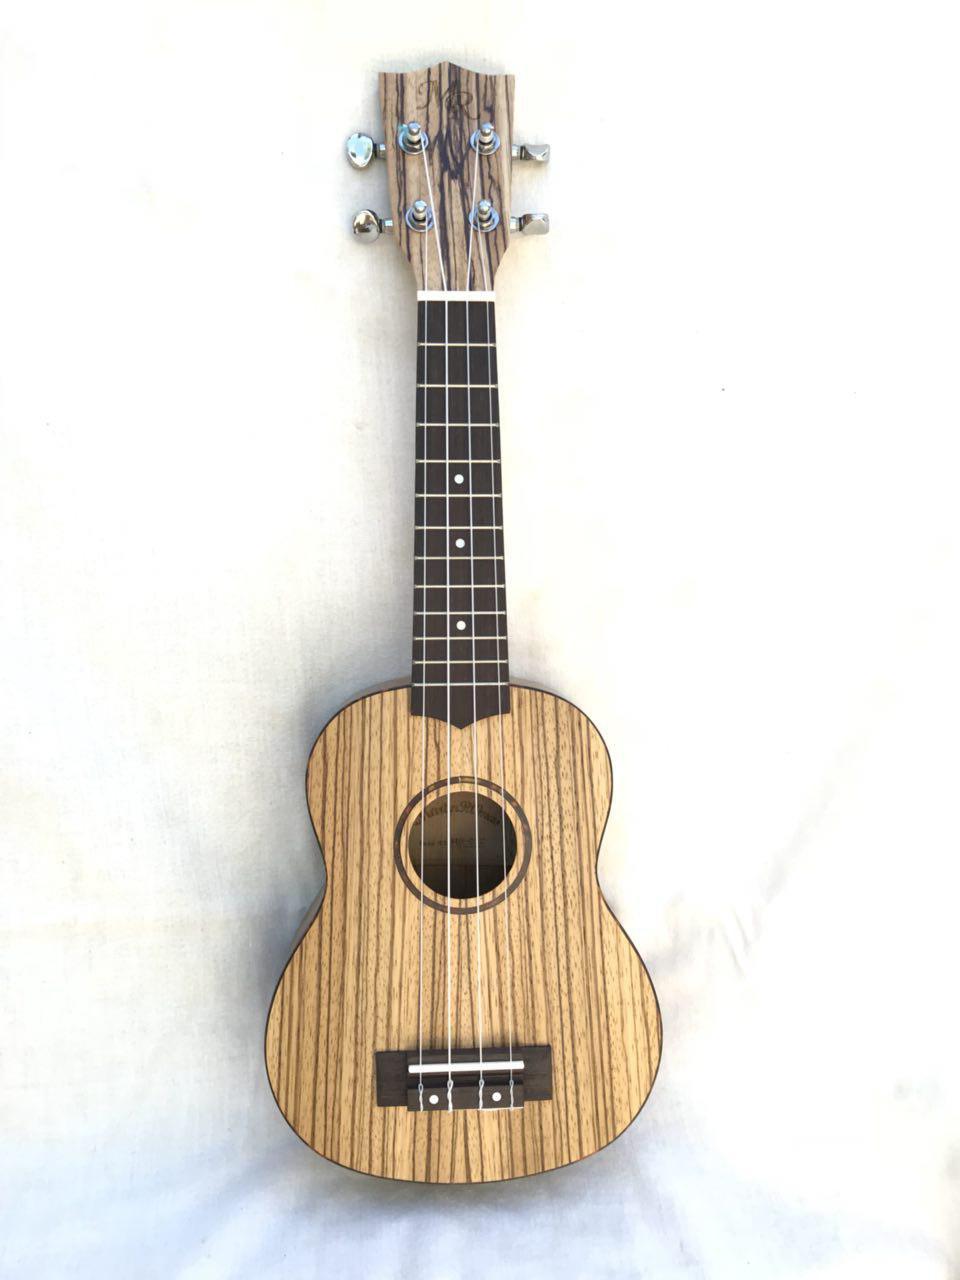 MARTIN ROMAS MR-01Z - Укулеле сопрано (21) цвет - натуральный, с ЧЕХЛОМ укулеле enya eut 20 с чехлом